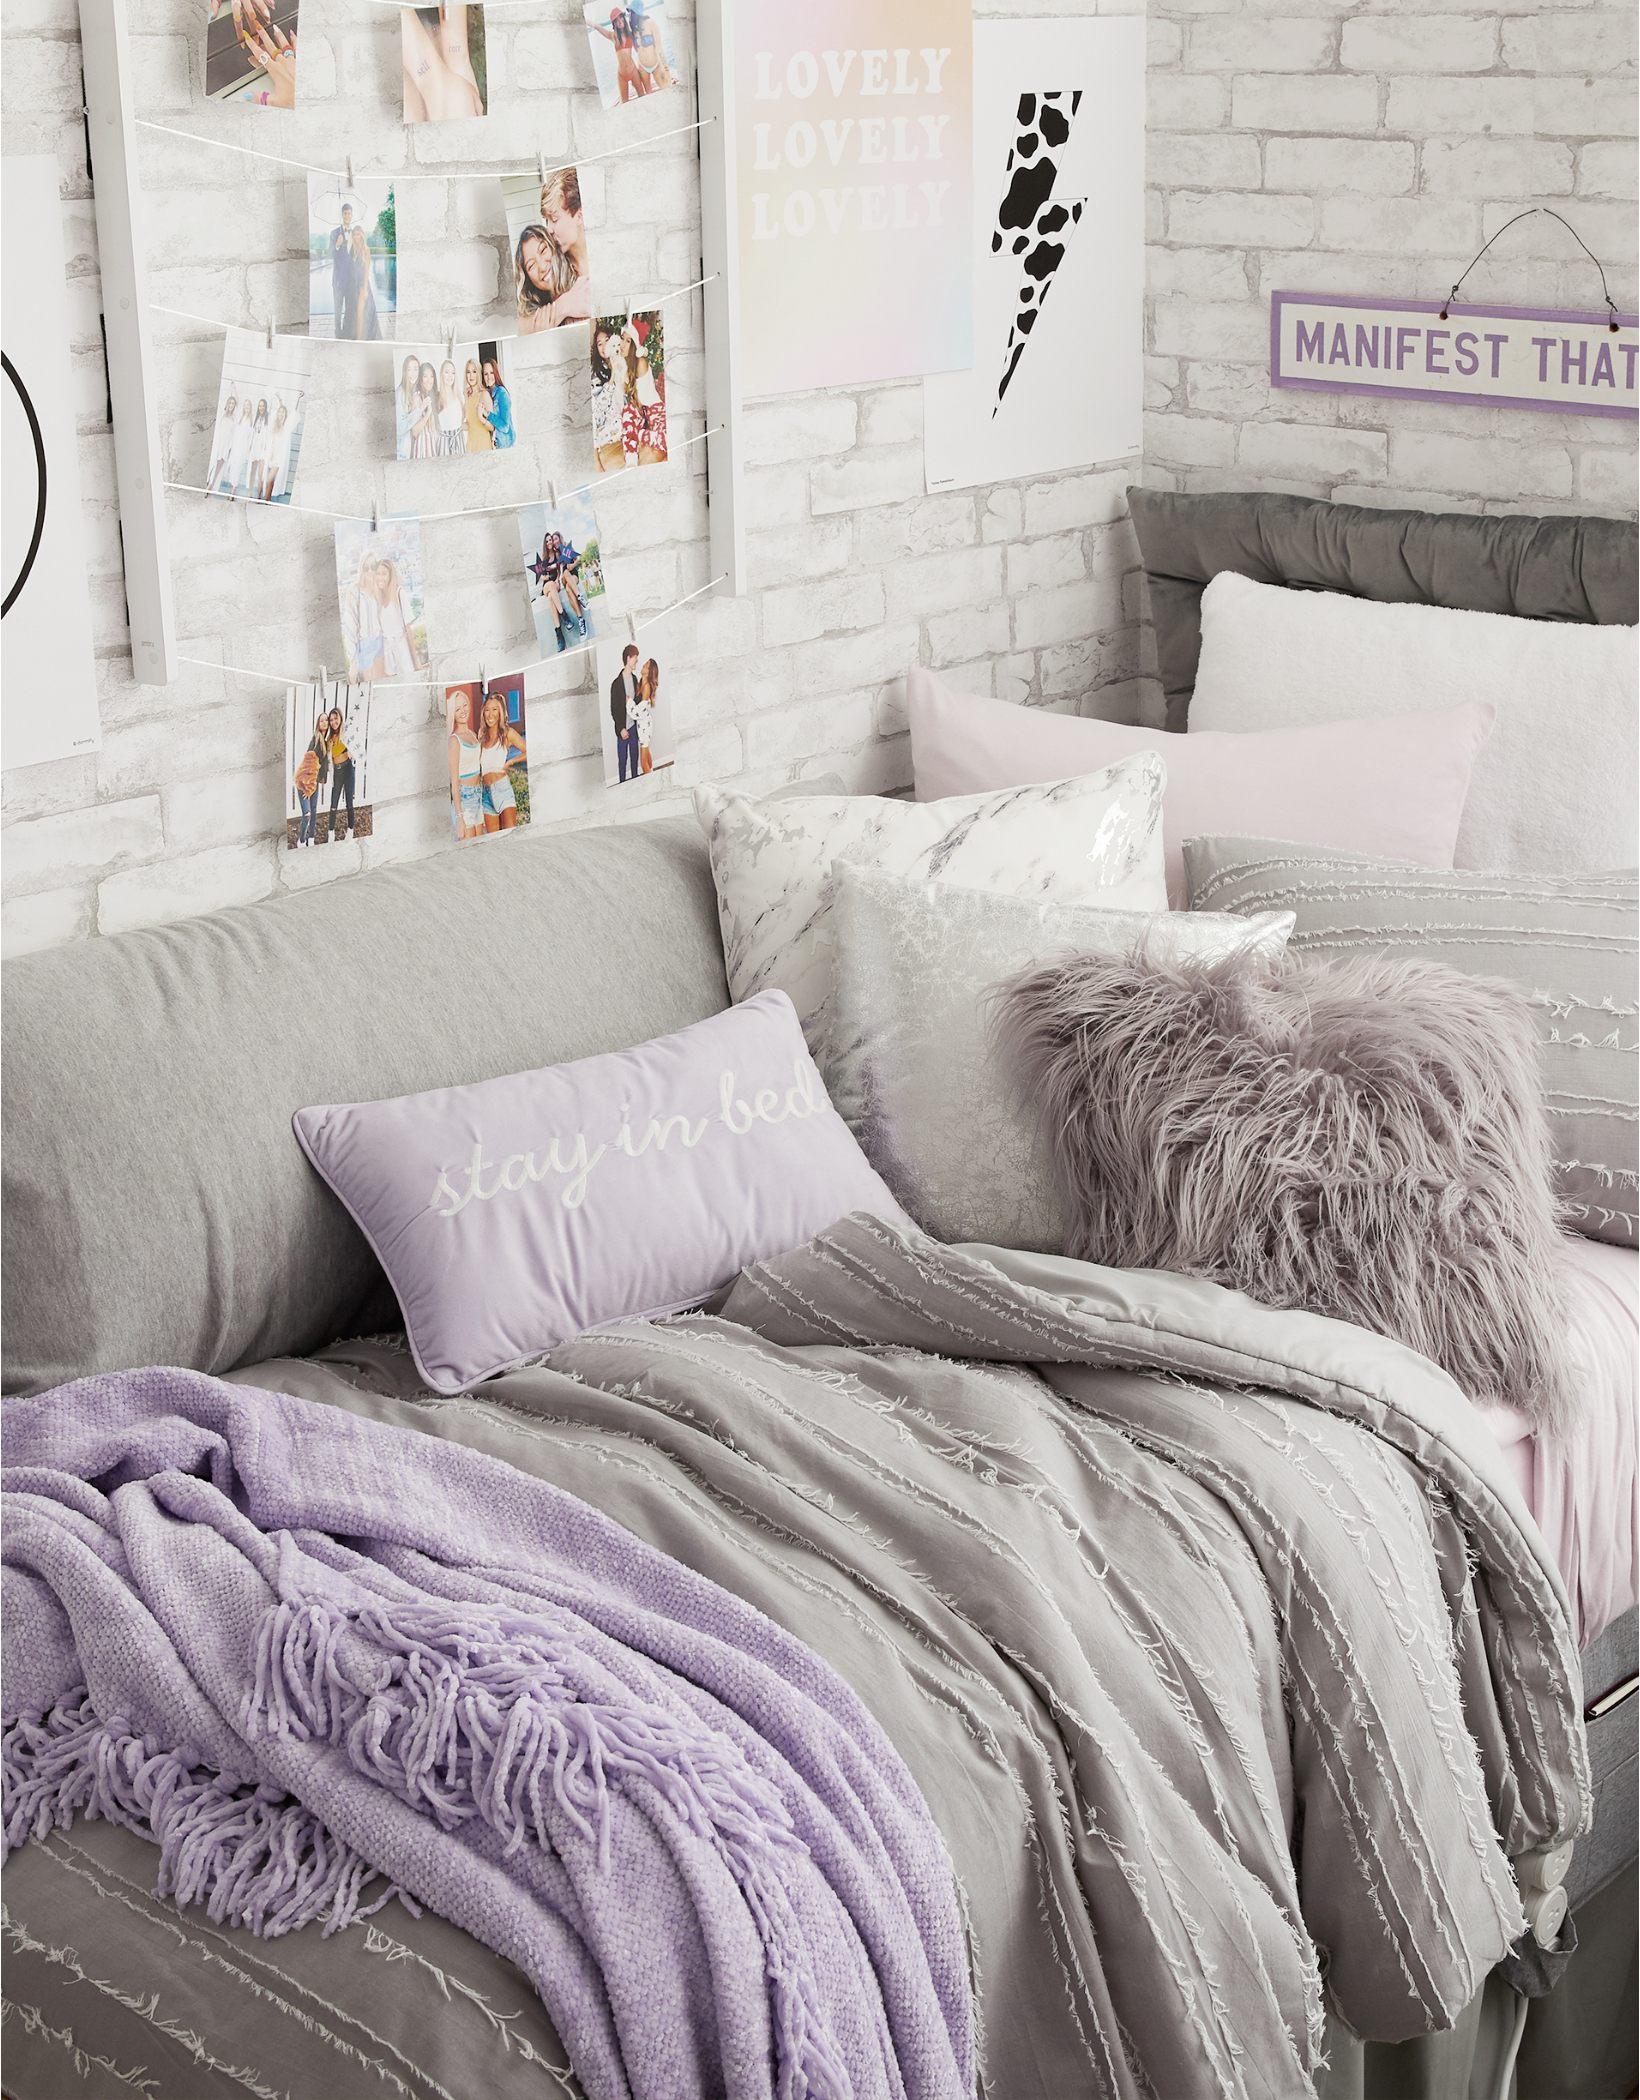 Dormify Eyelash Twin XL Comforter & Sham Set